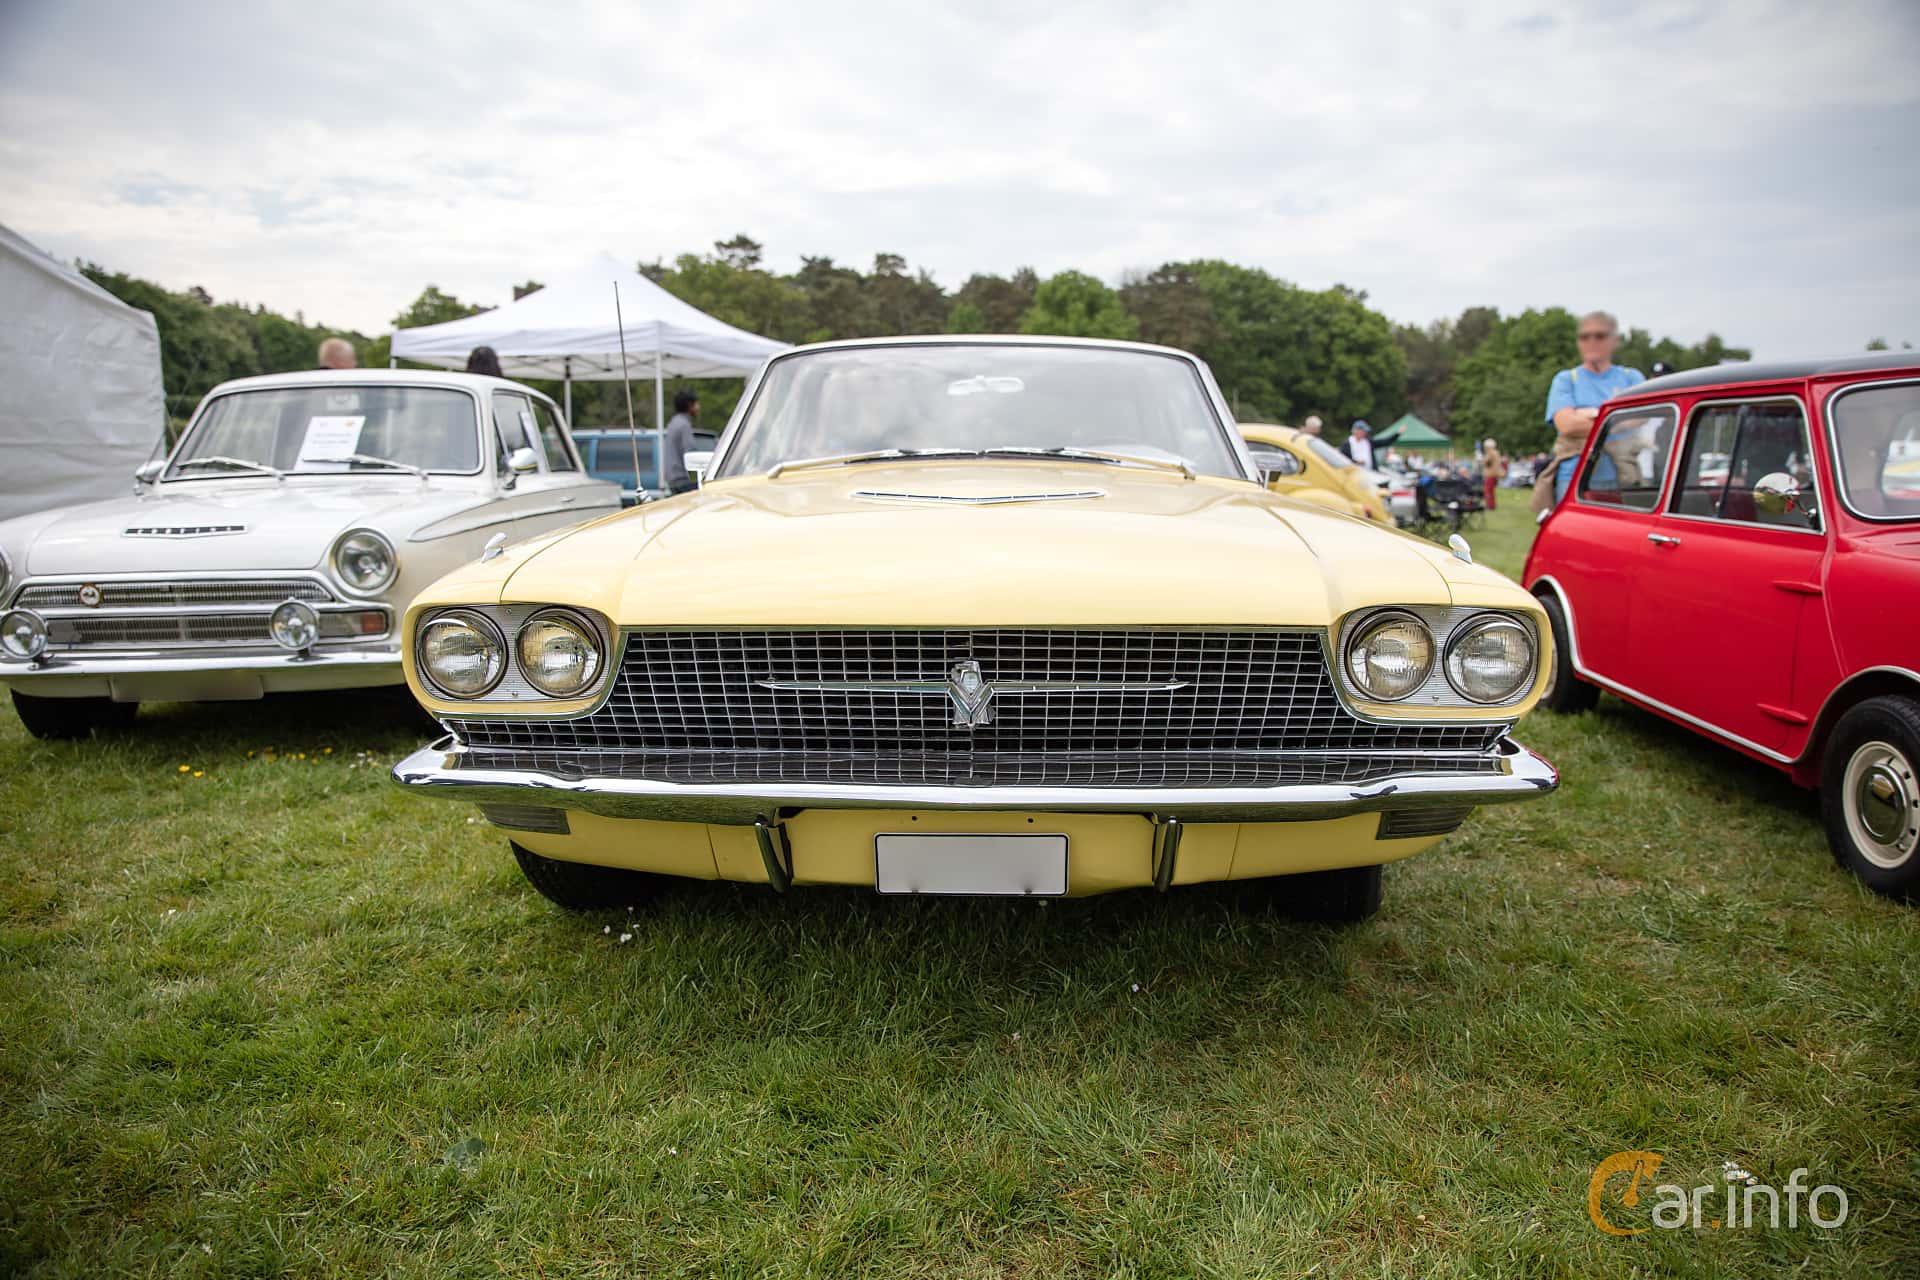 Ford Thunderbird Hardtop 6.4 V8 Automatic, 305hp, 1966 at Tjolöholm Classic Motor 2016